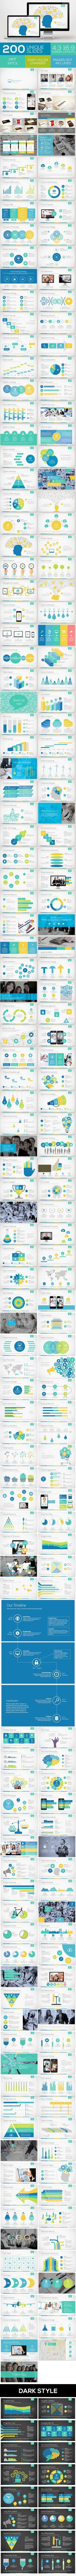 Akuntansi Powerpoint PowerPoint Template / Theme / Presentation / Slides / Background / Power Point #powerpoint #template #theme: